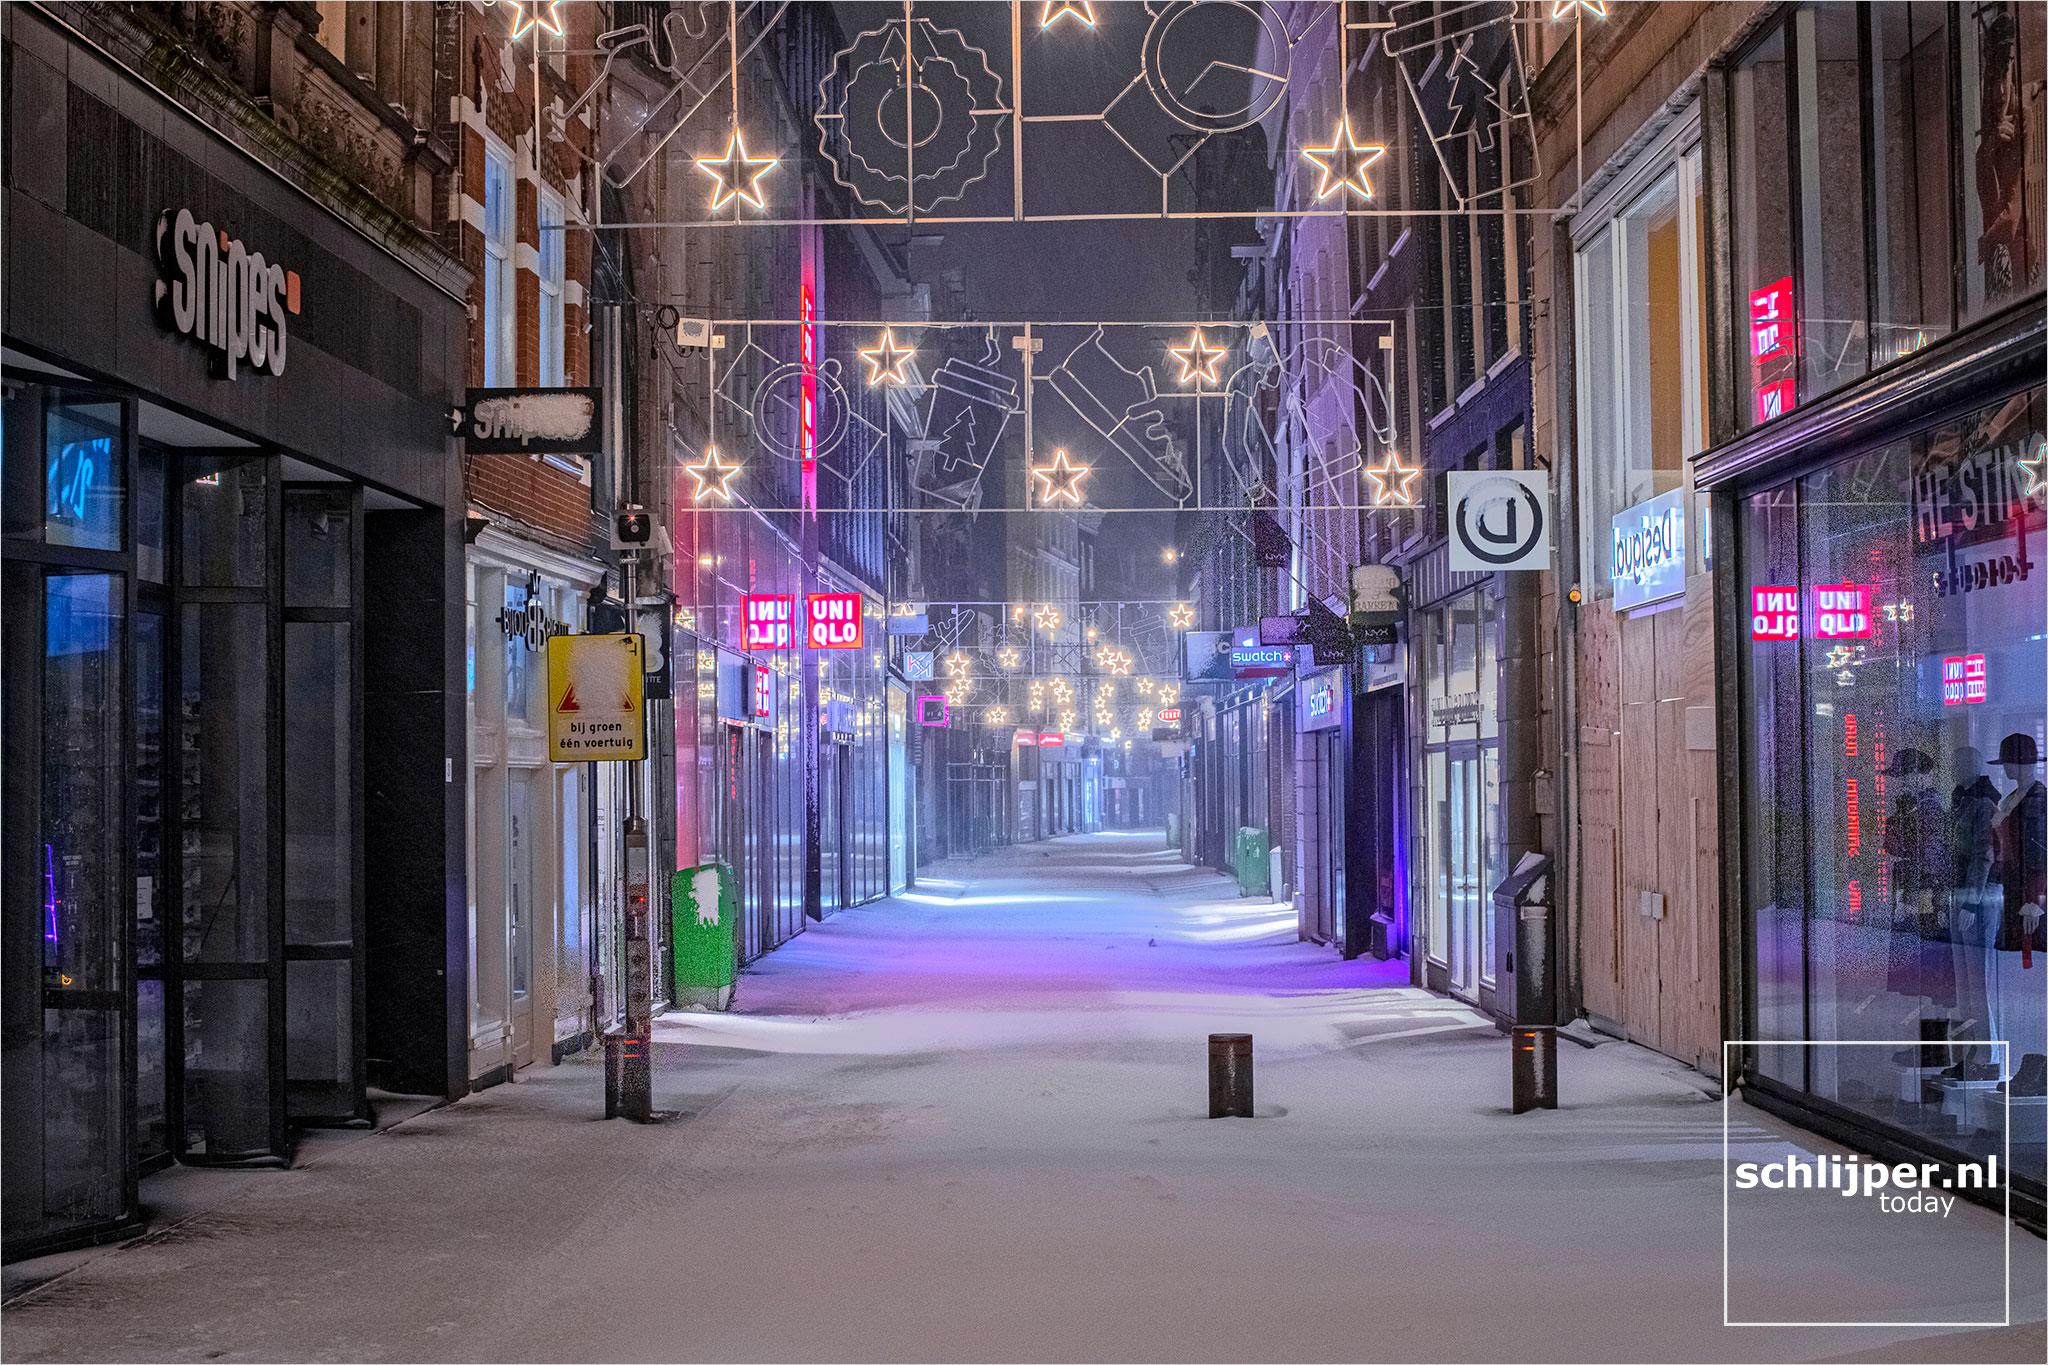 The Netherlands, Amsterdam, 7 februari 2021